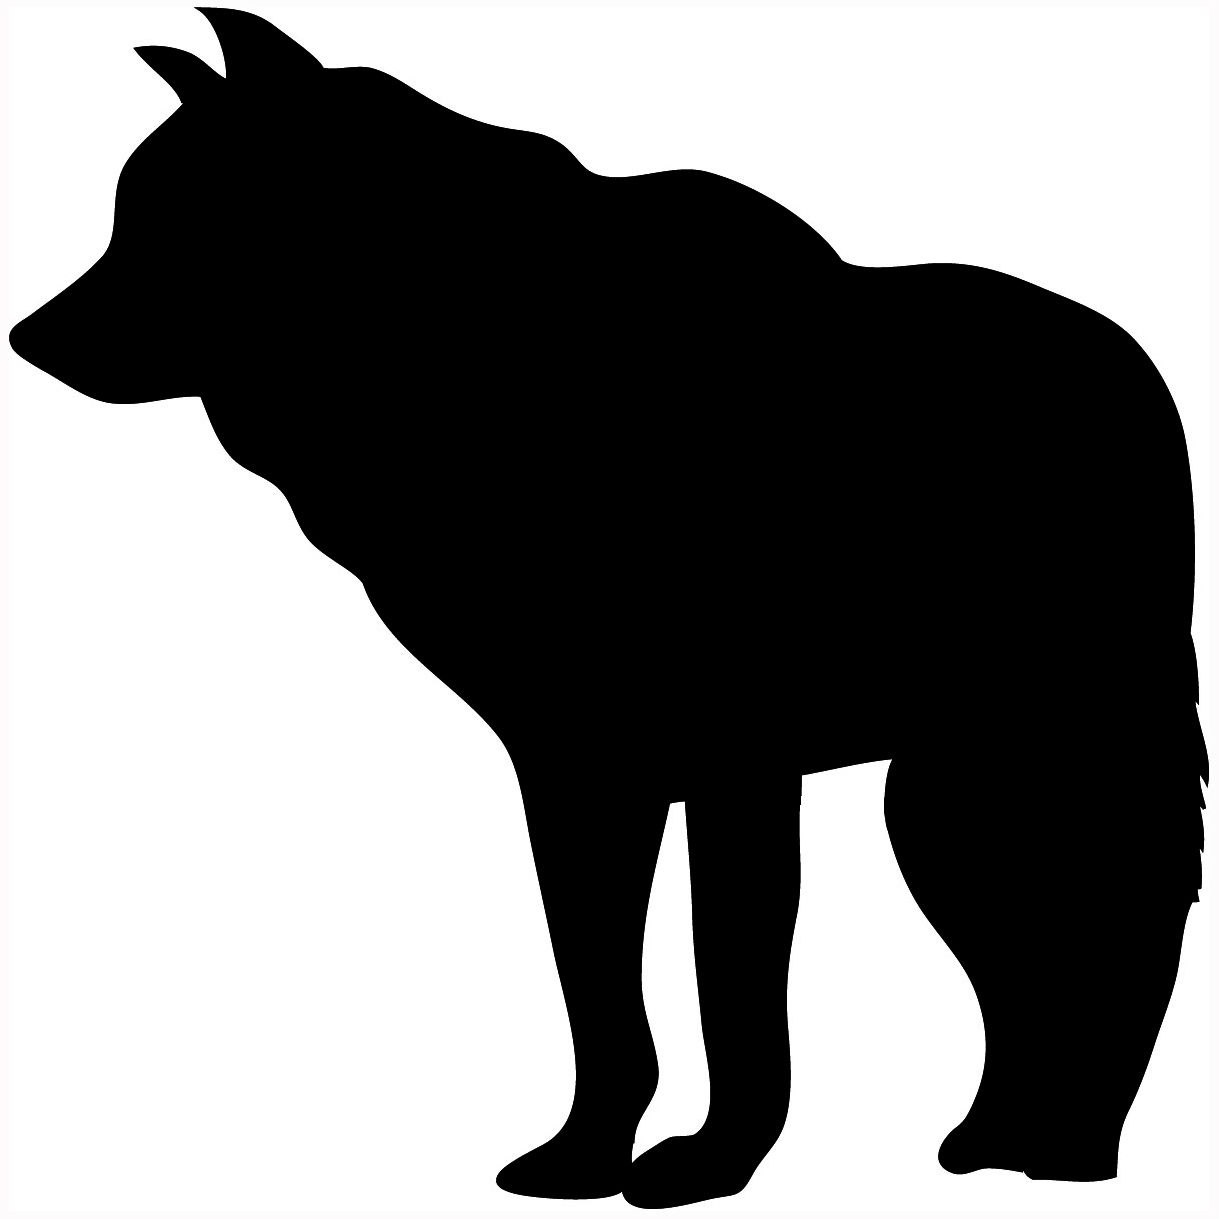 1219x1219 Wolf Silhouette. Silhouettes Silhouettes, Wolf